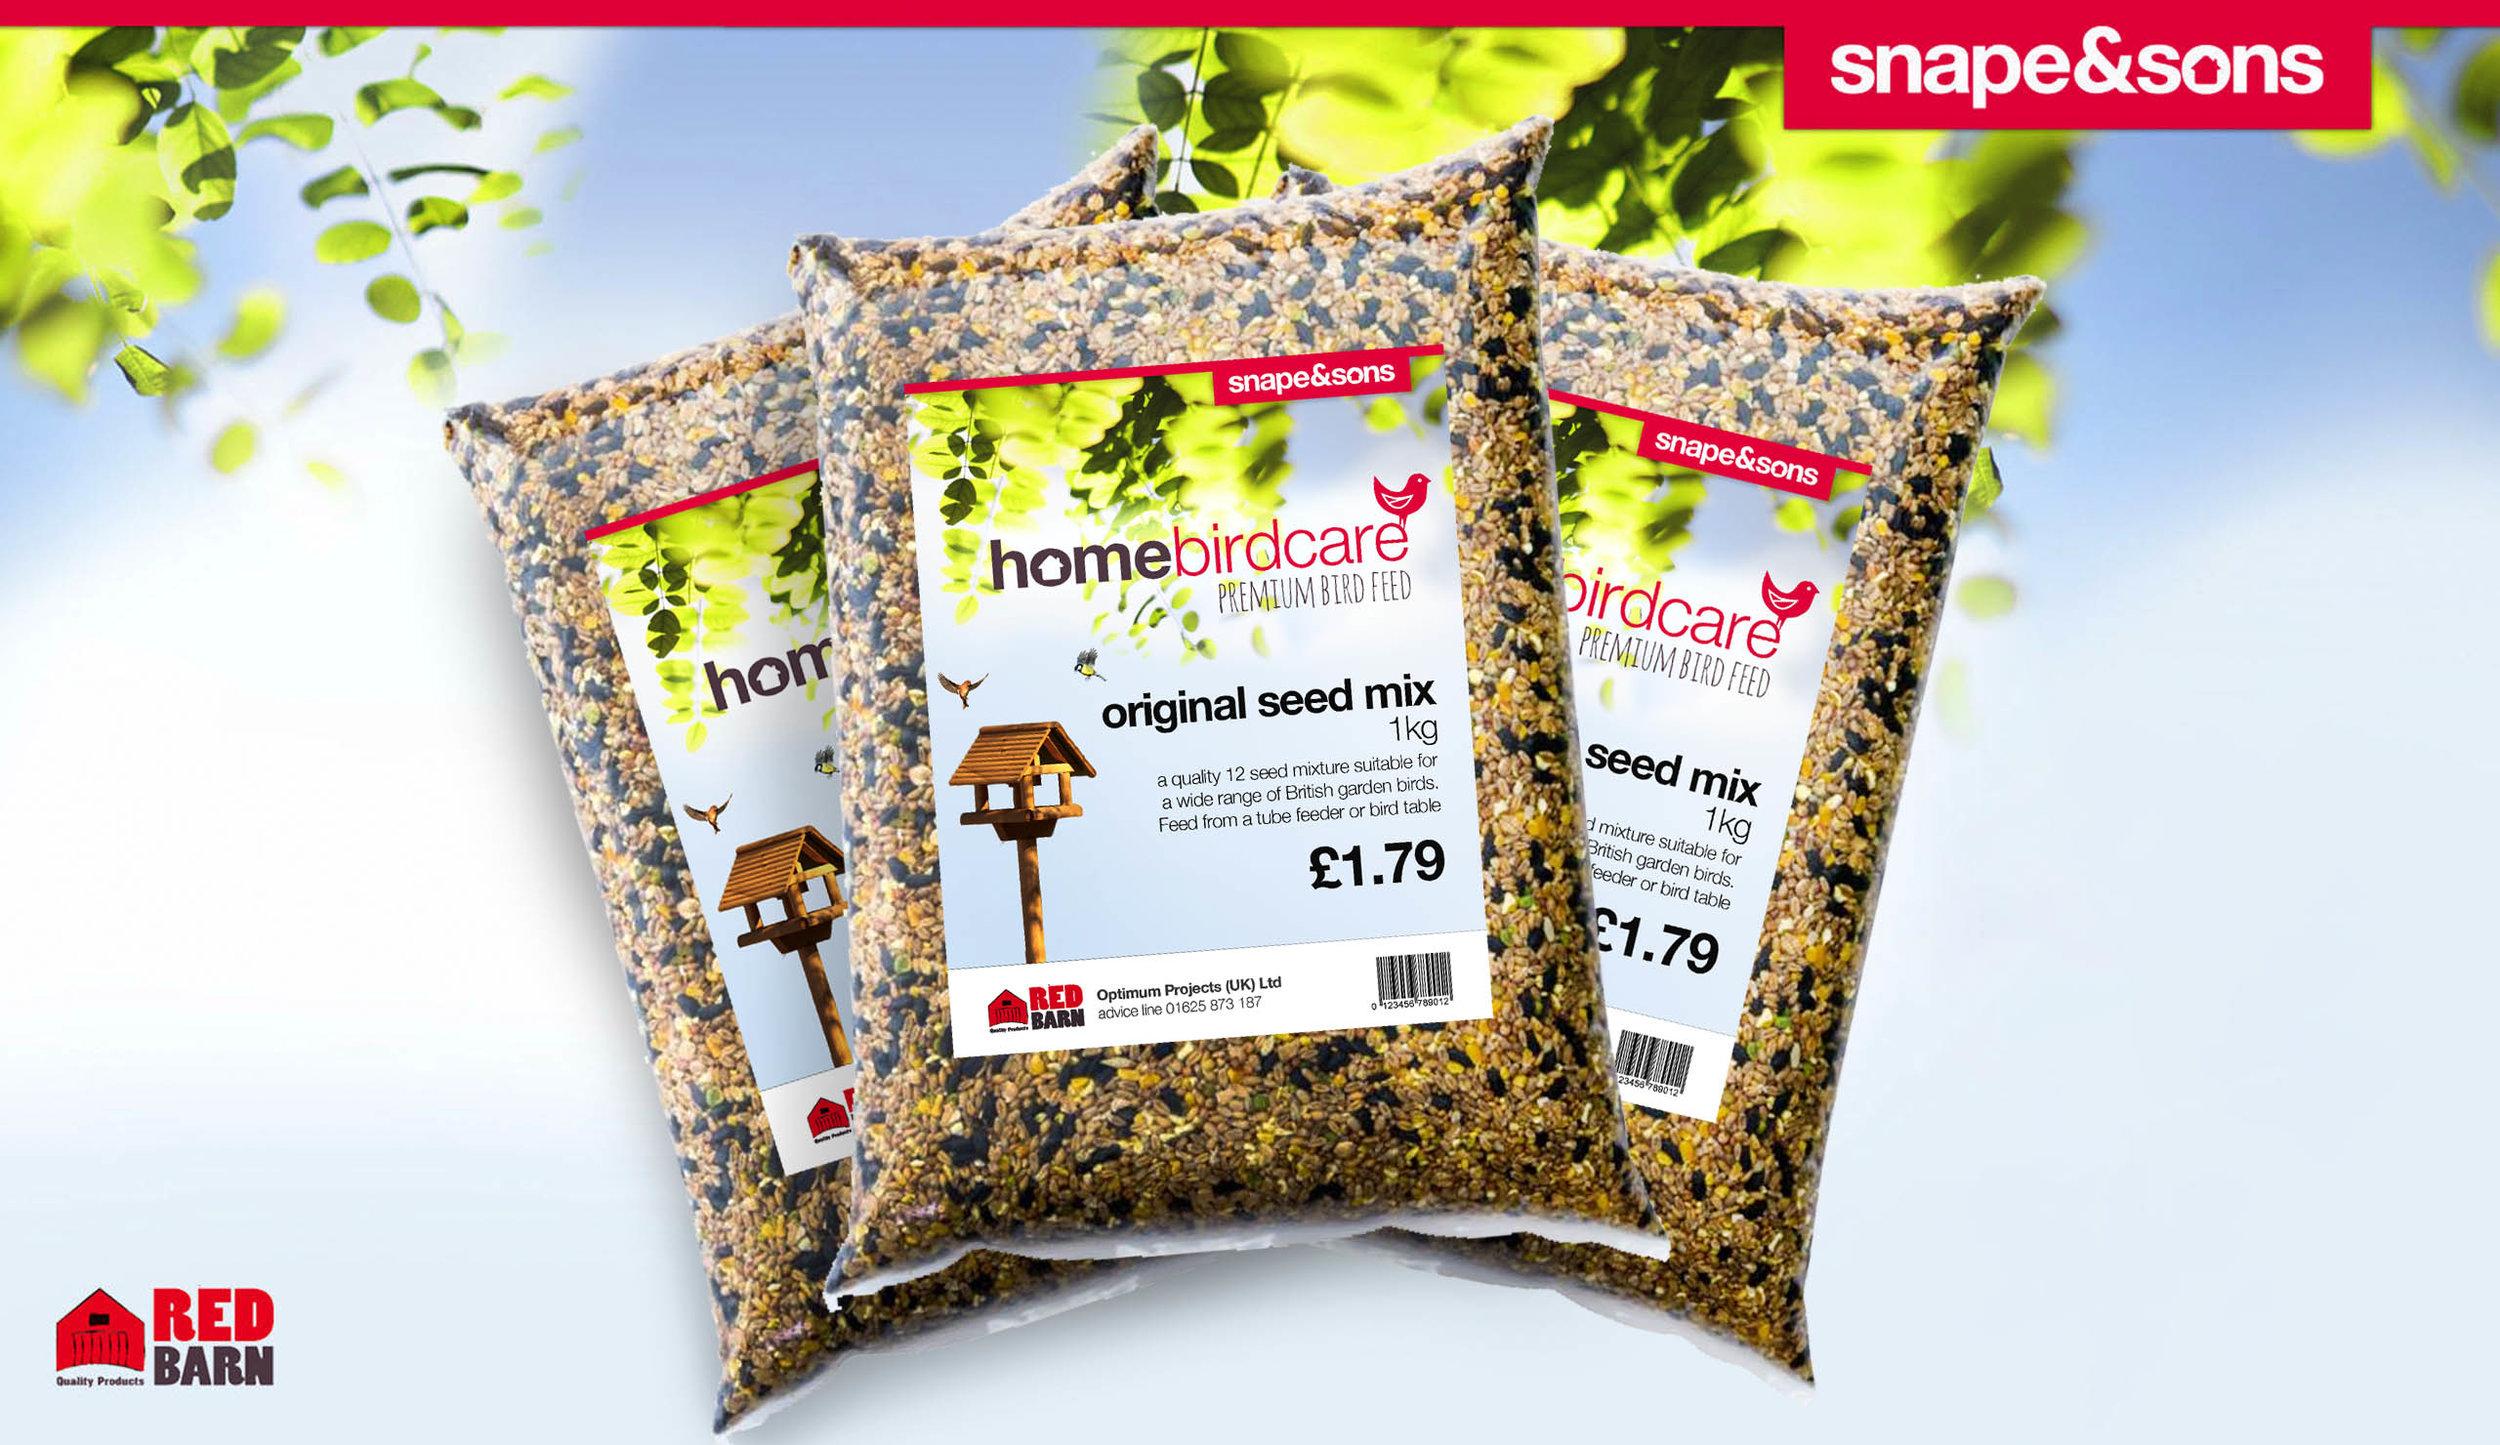 homebirdcare-premium-bird-feed-packaging.jpg